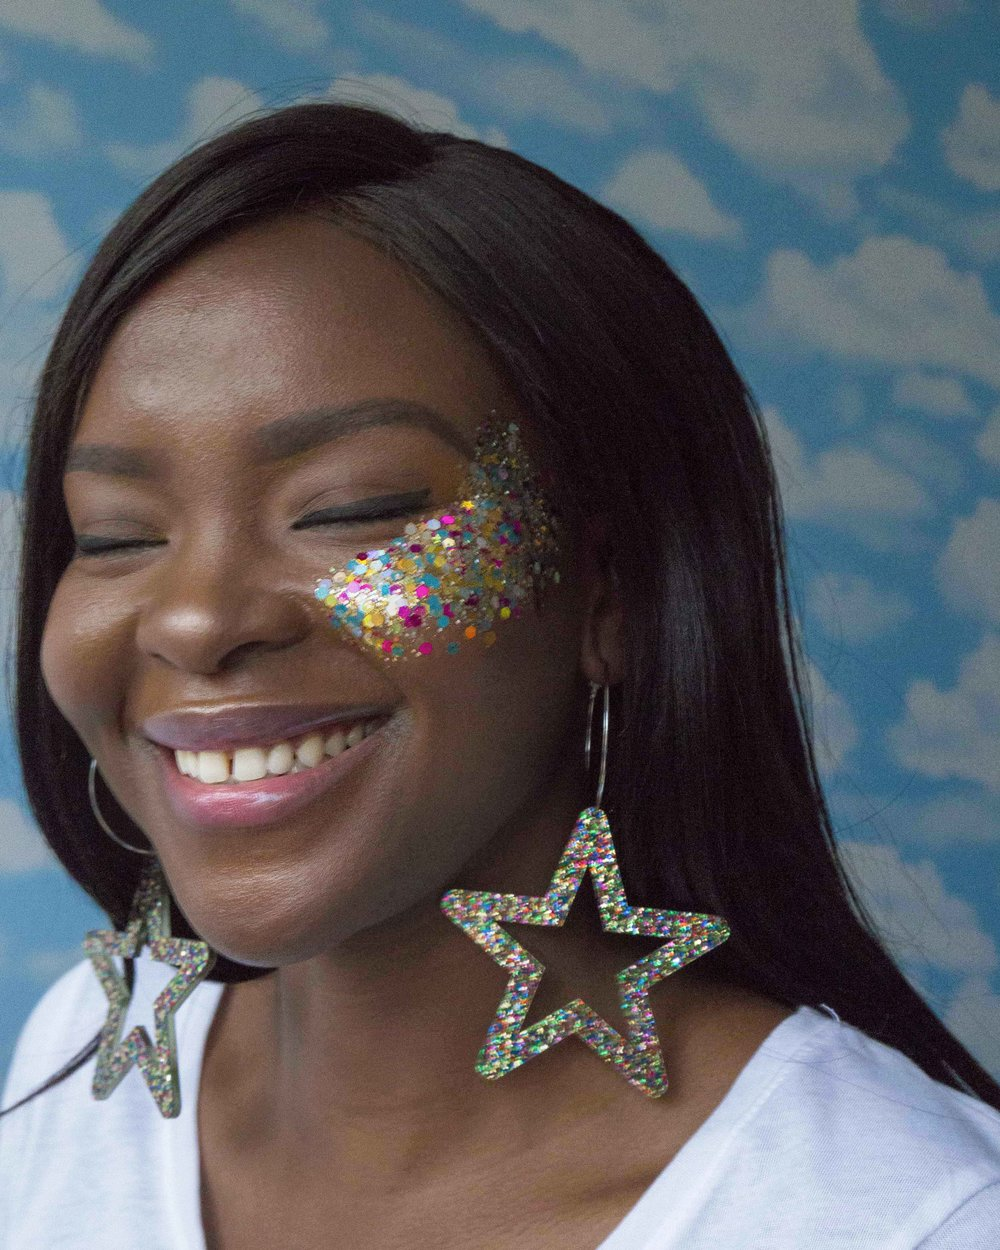 8 Large Star Smile.jpg